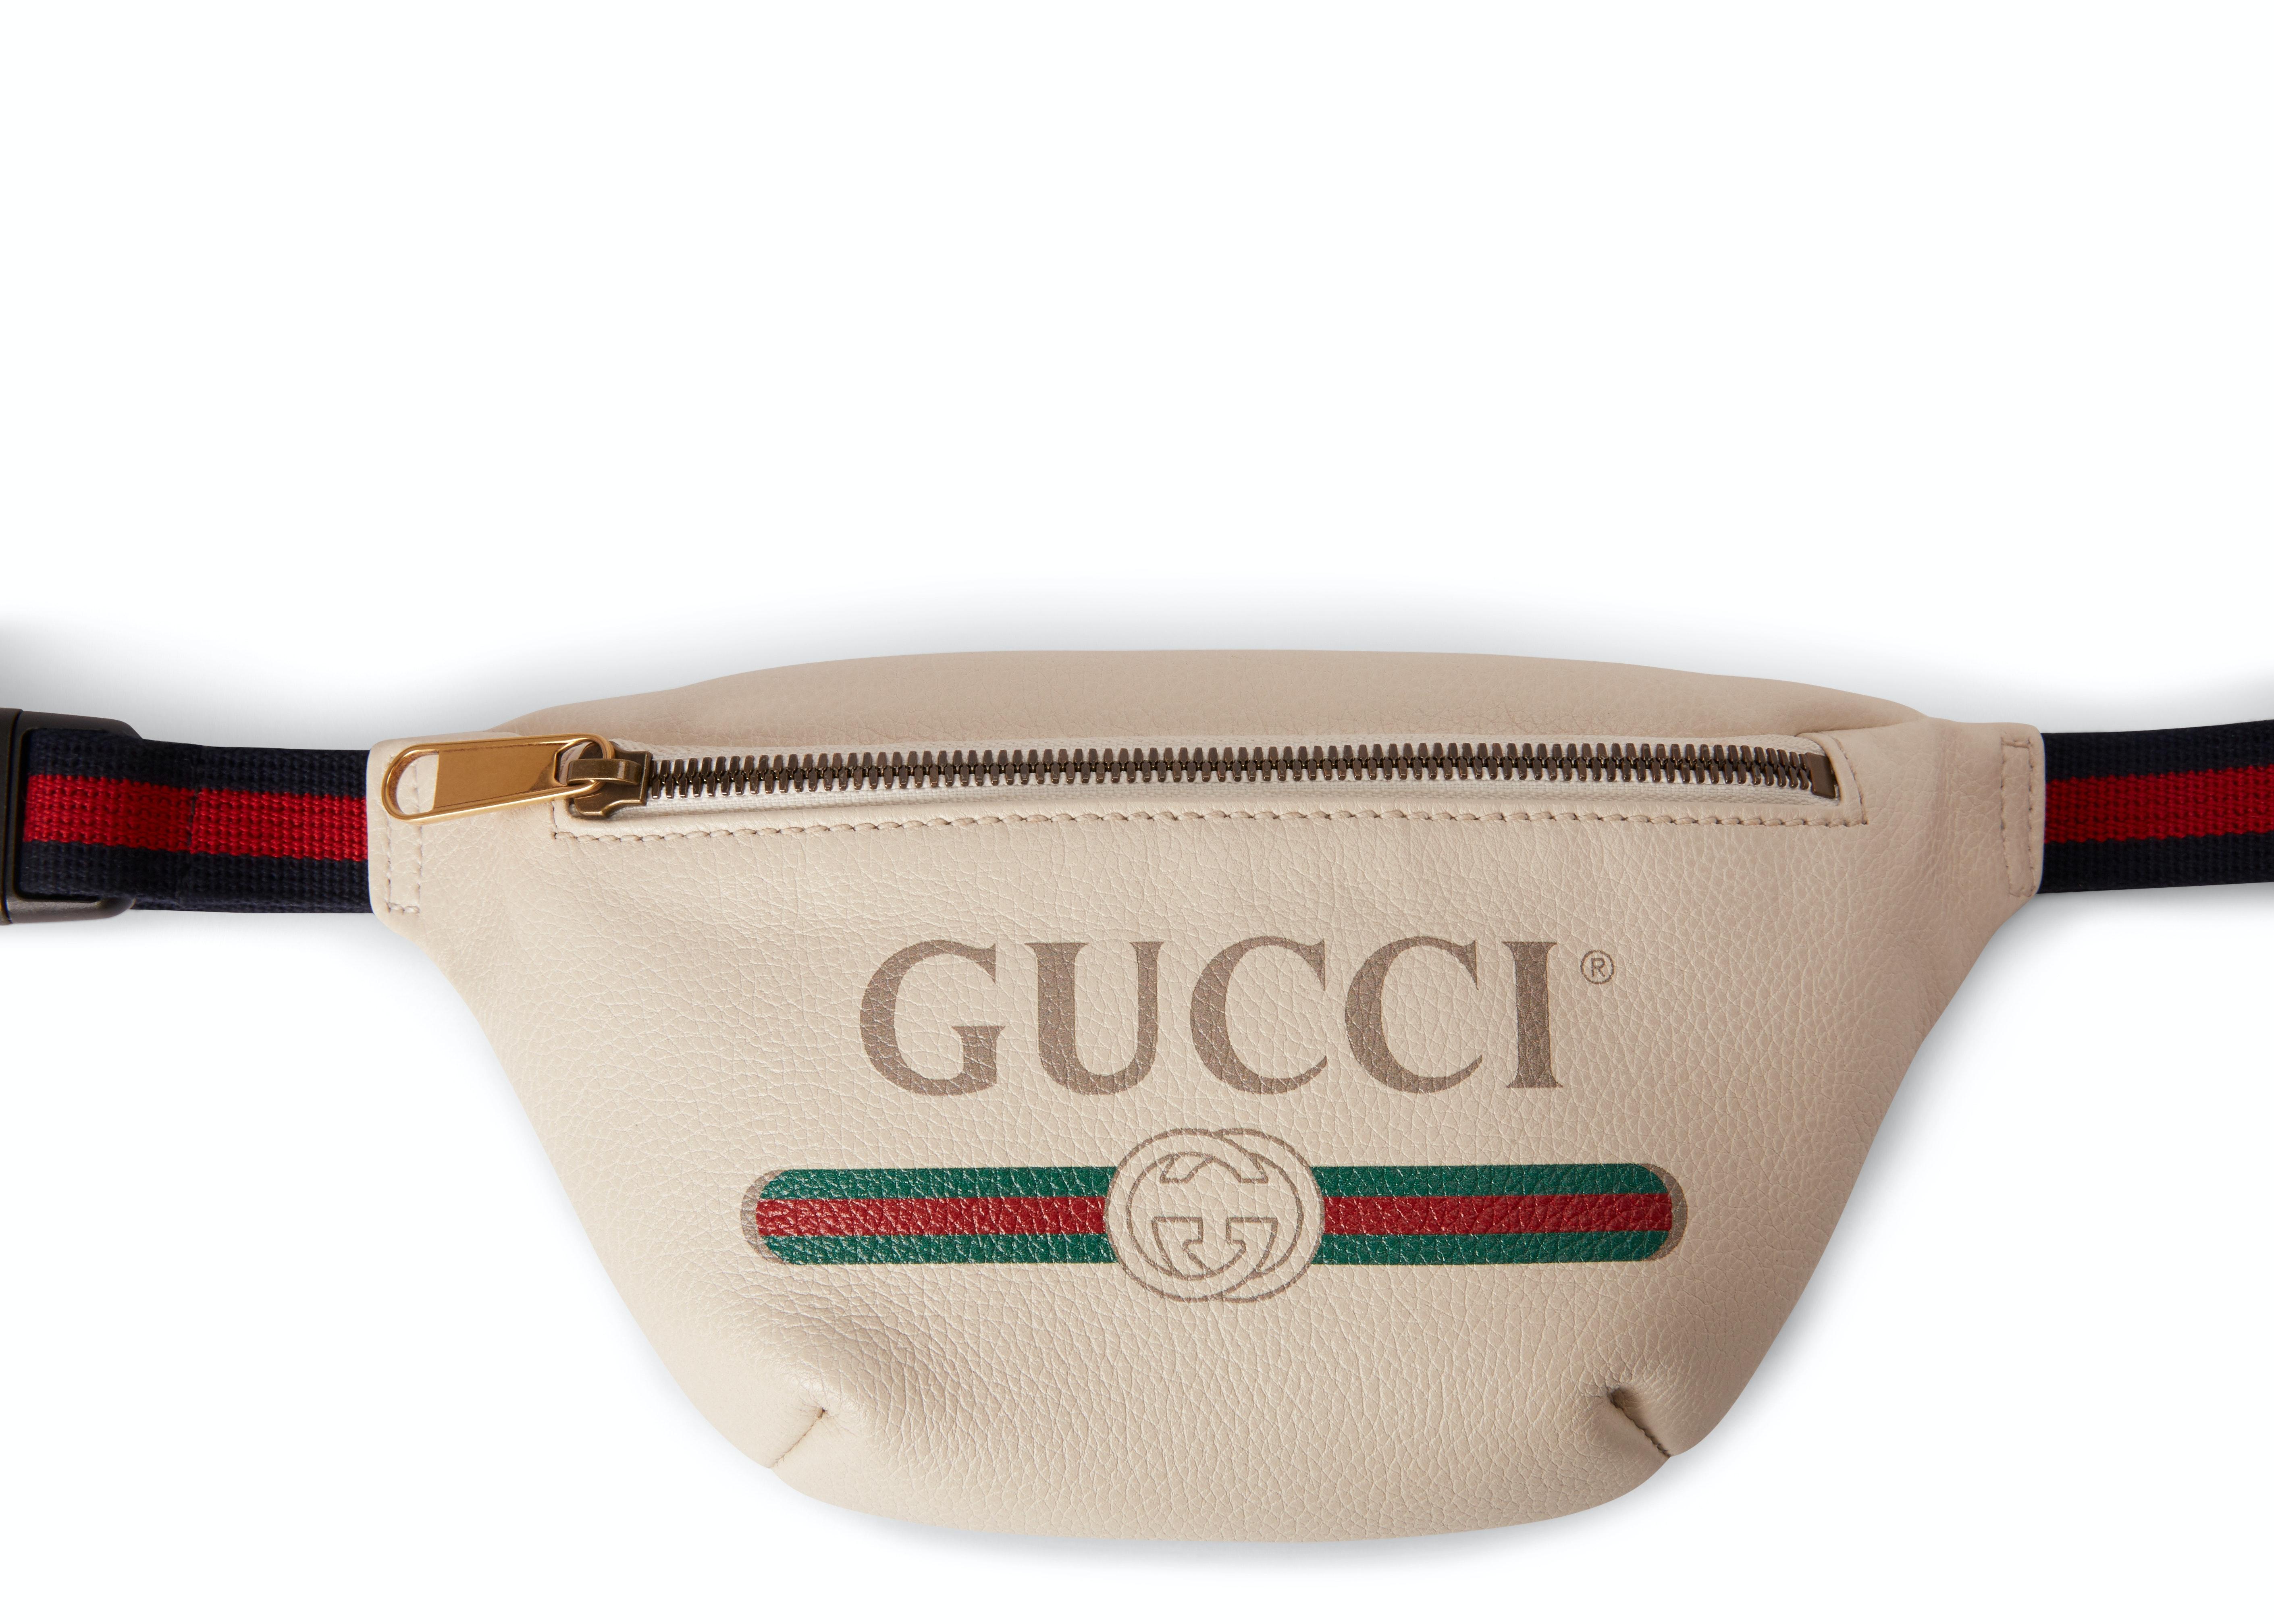 Gucci Print Belt Bag Vintage Logo Small White